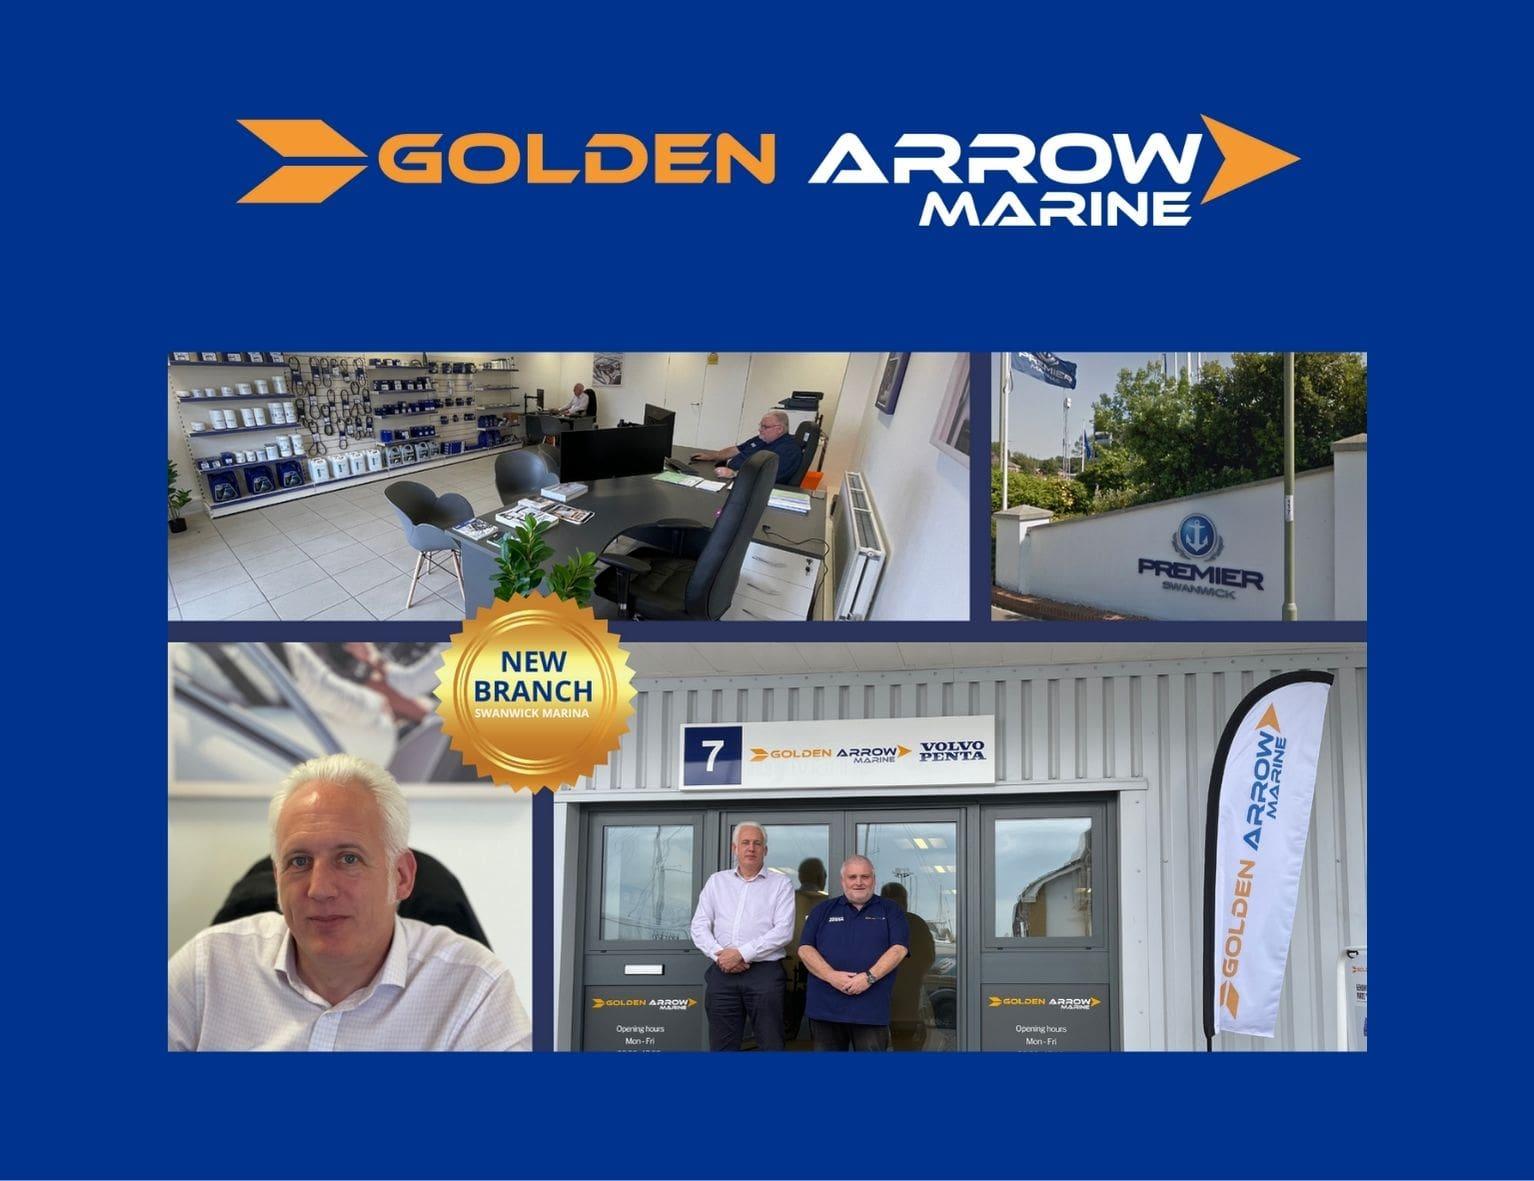 New Golden Arrow Marine branch